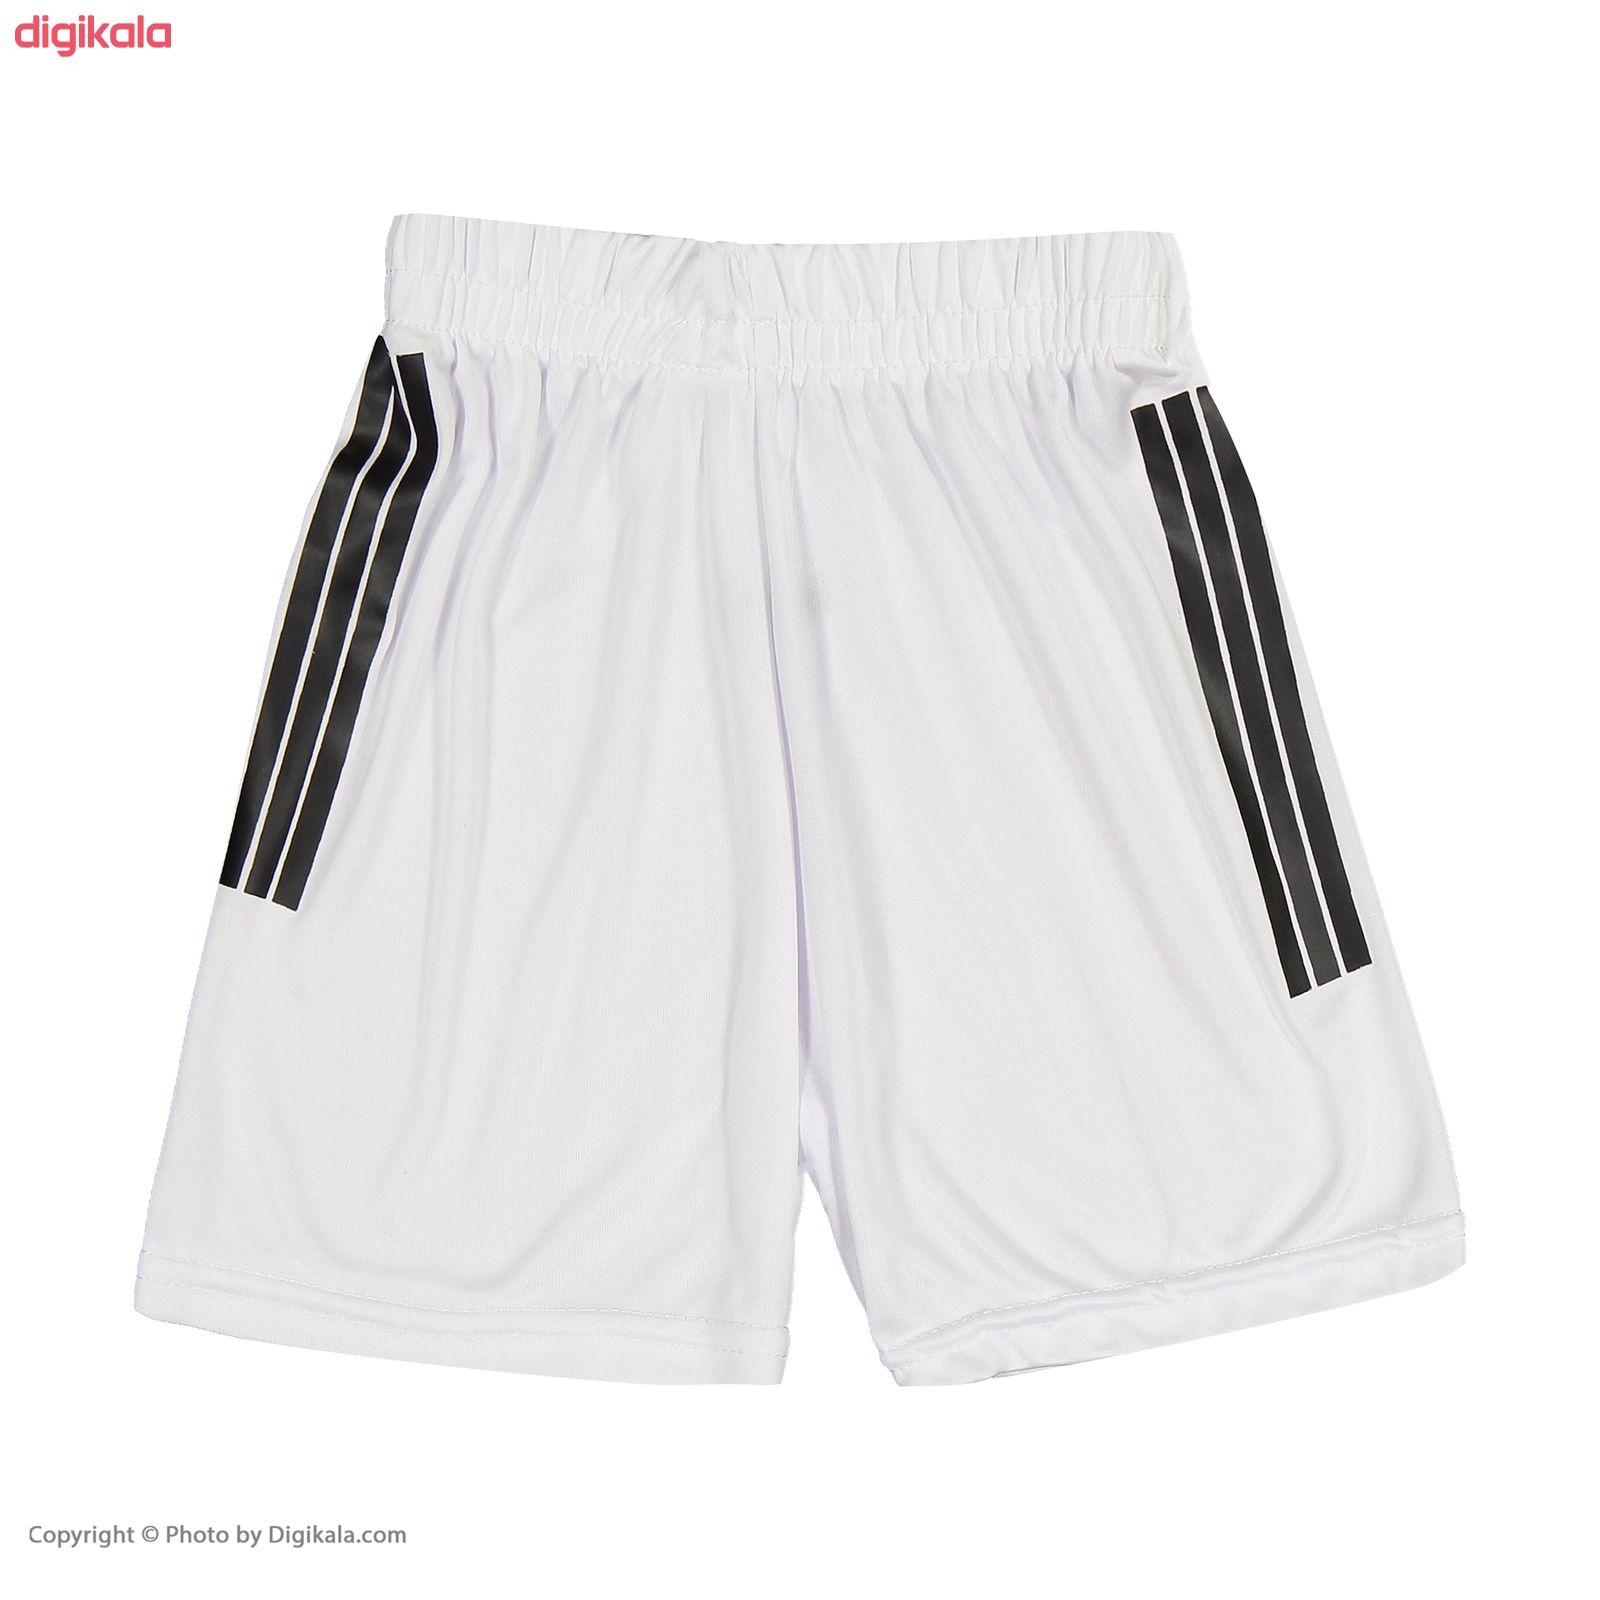 ست پیراهن و شورت ورزشی پسرانه طرح یوونتوس مدل رونالدو کد p.sh.007 main 1 5